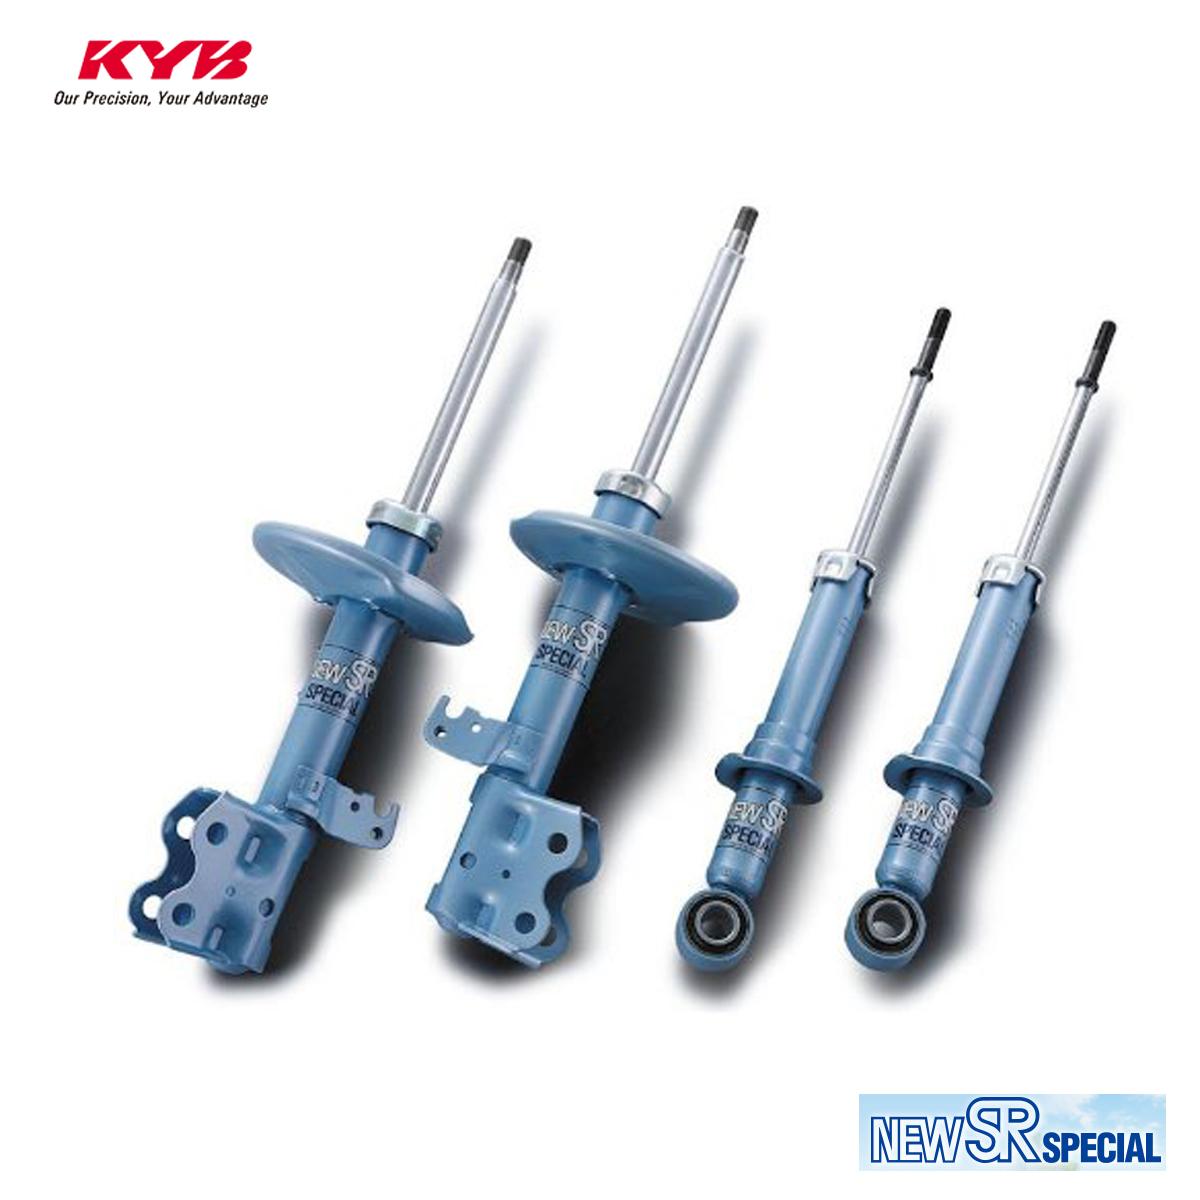 KYB カヤバ ティーダラティオ SJC11 ショックアブソーバー フロント 右用 1本 NEW SR SPECIAL NST5289R 配送先条件有り